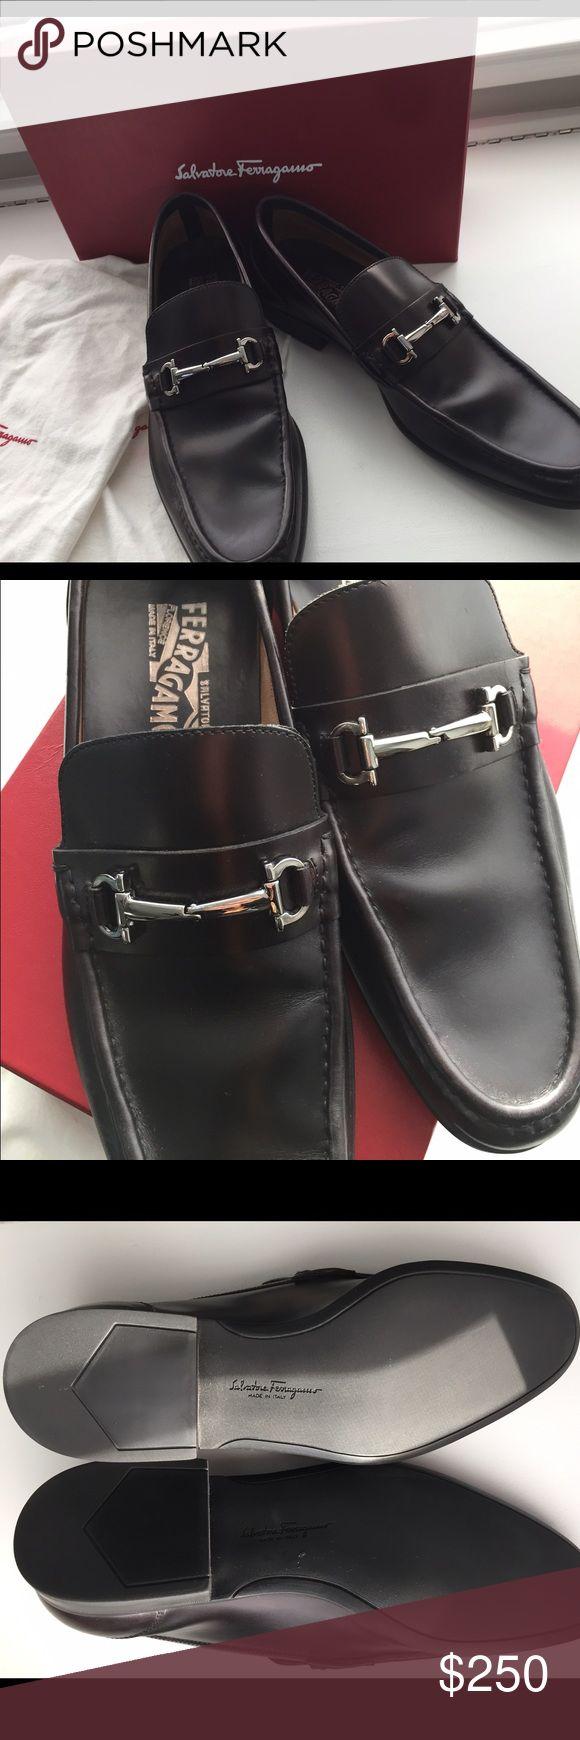 NWT Salvatore Ferragamo Men's black dress shoe. NWT Salvatore Ferragamo Men's black dress shoe. Size 10.5  An absolutely beautiful men's shoe!! Salvatore Ferragamo Shoes Loafers & Slip-Ons